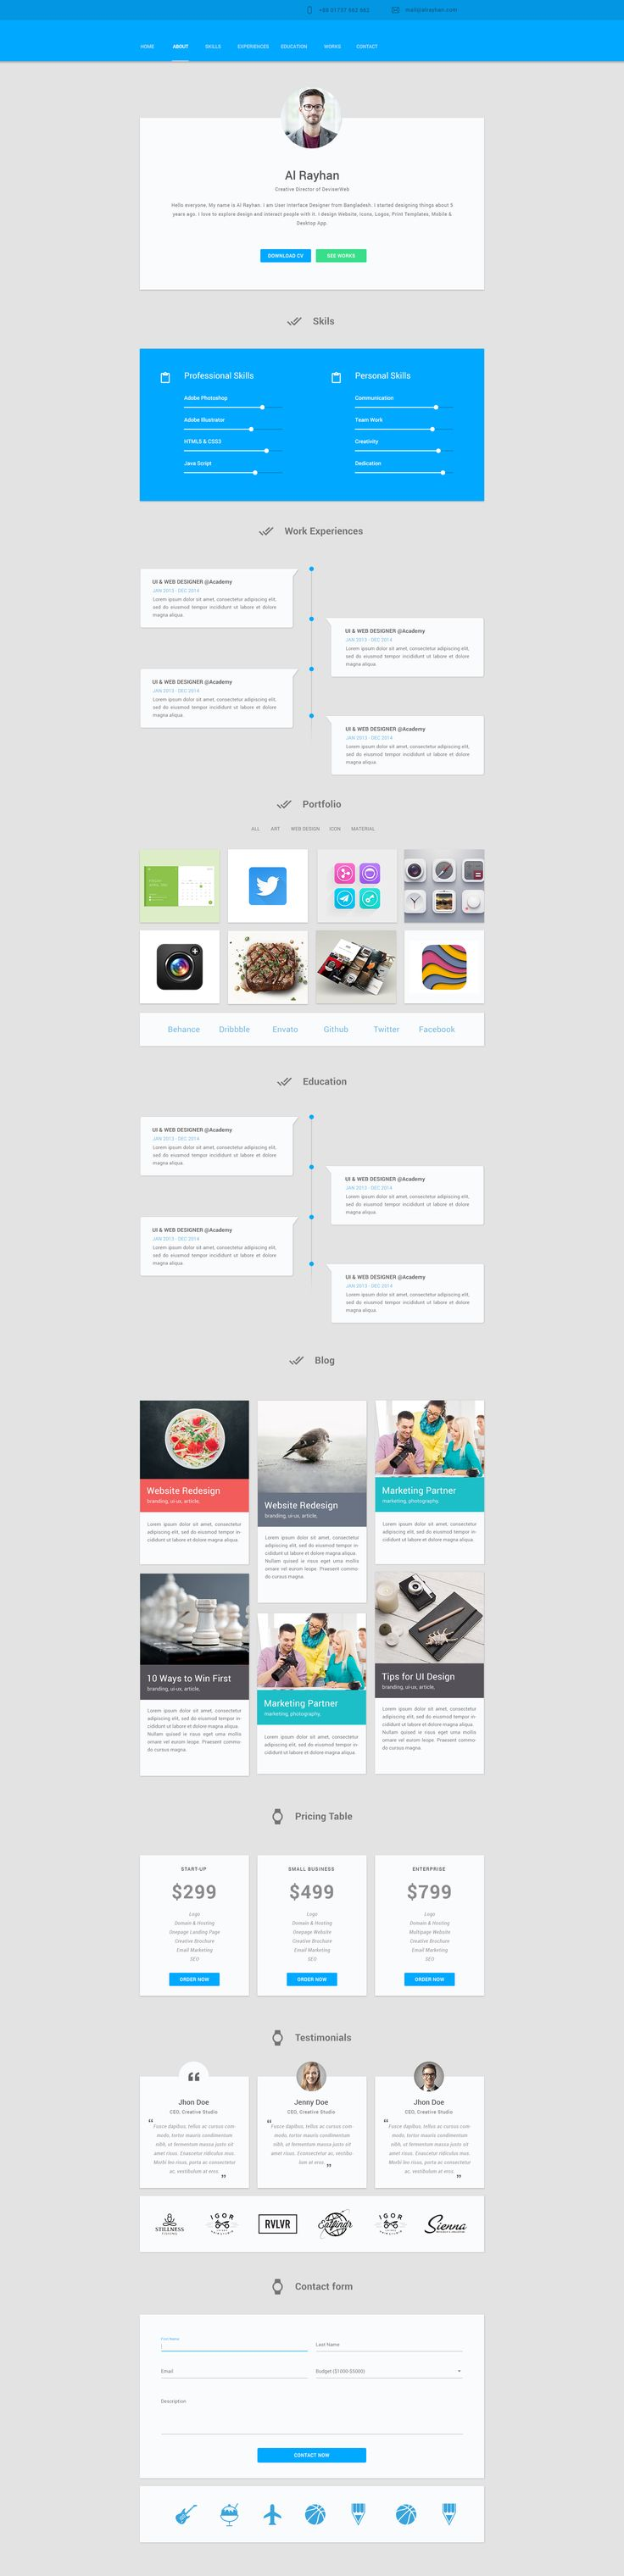 best images about resume creative resume cv material design personal online resume cv website